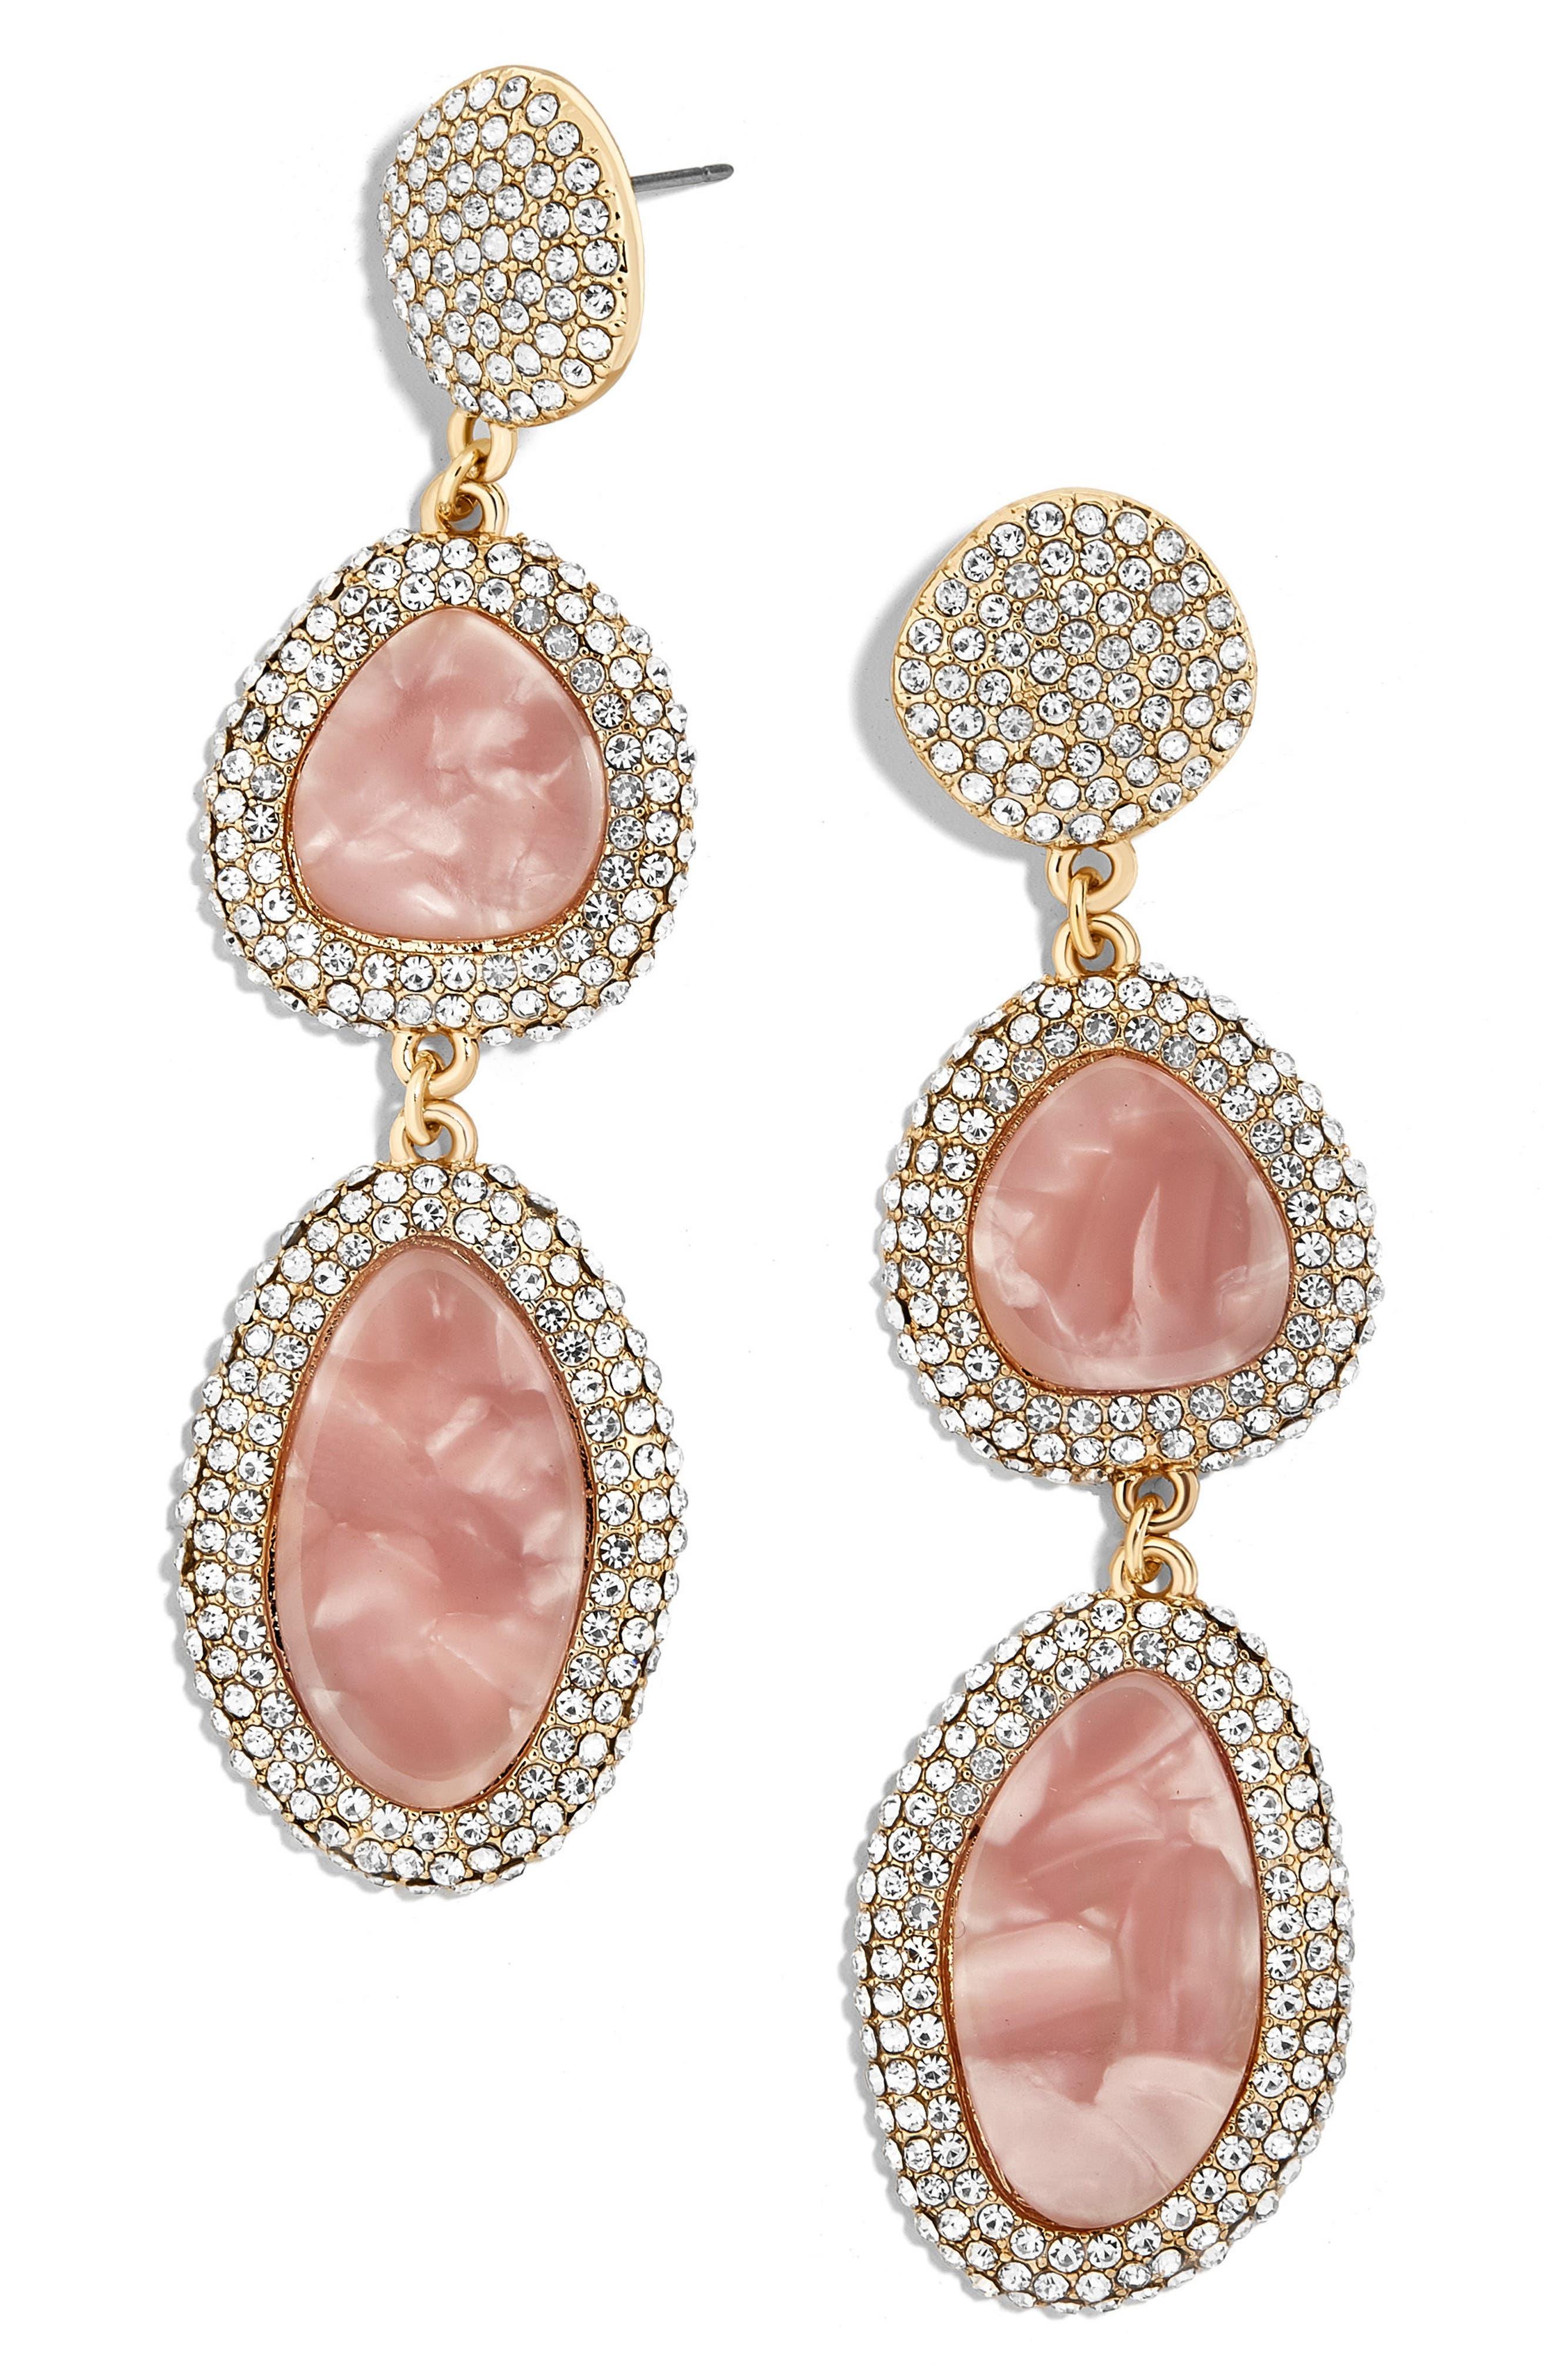 Enity Drop Earrings,                         Main,                         color, Blush